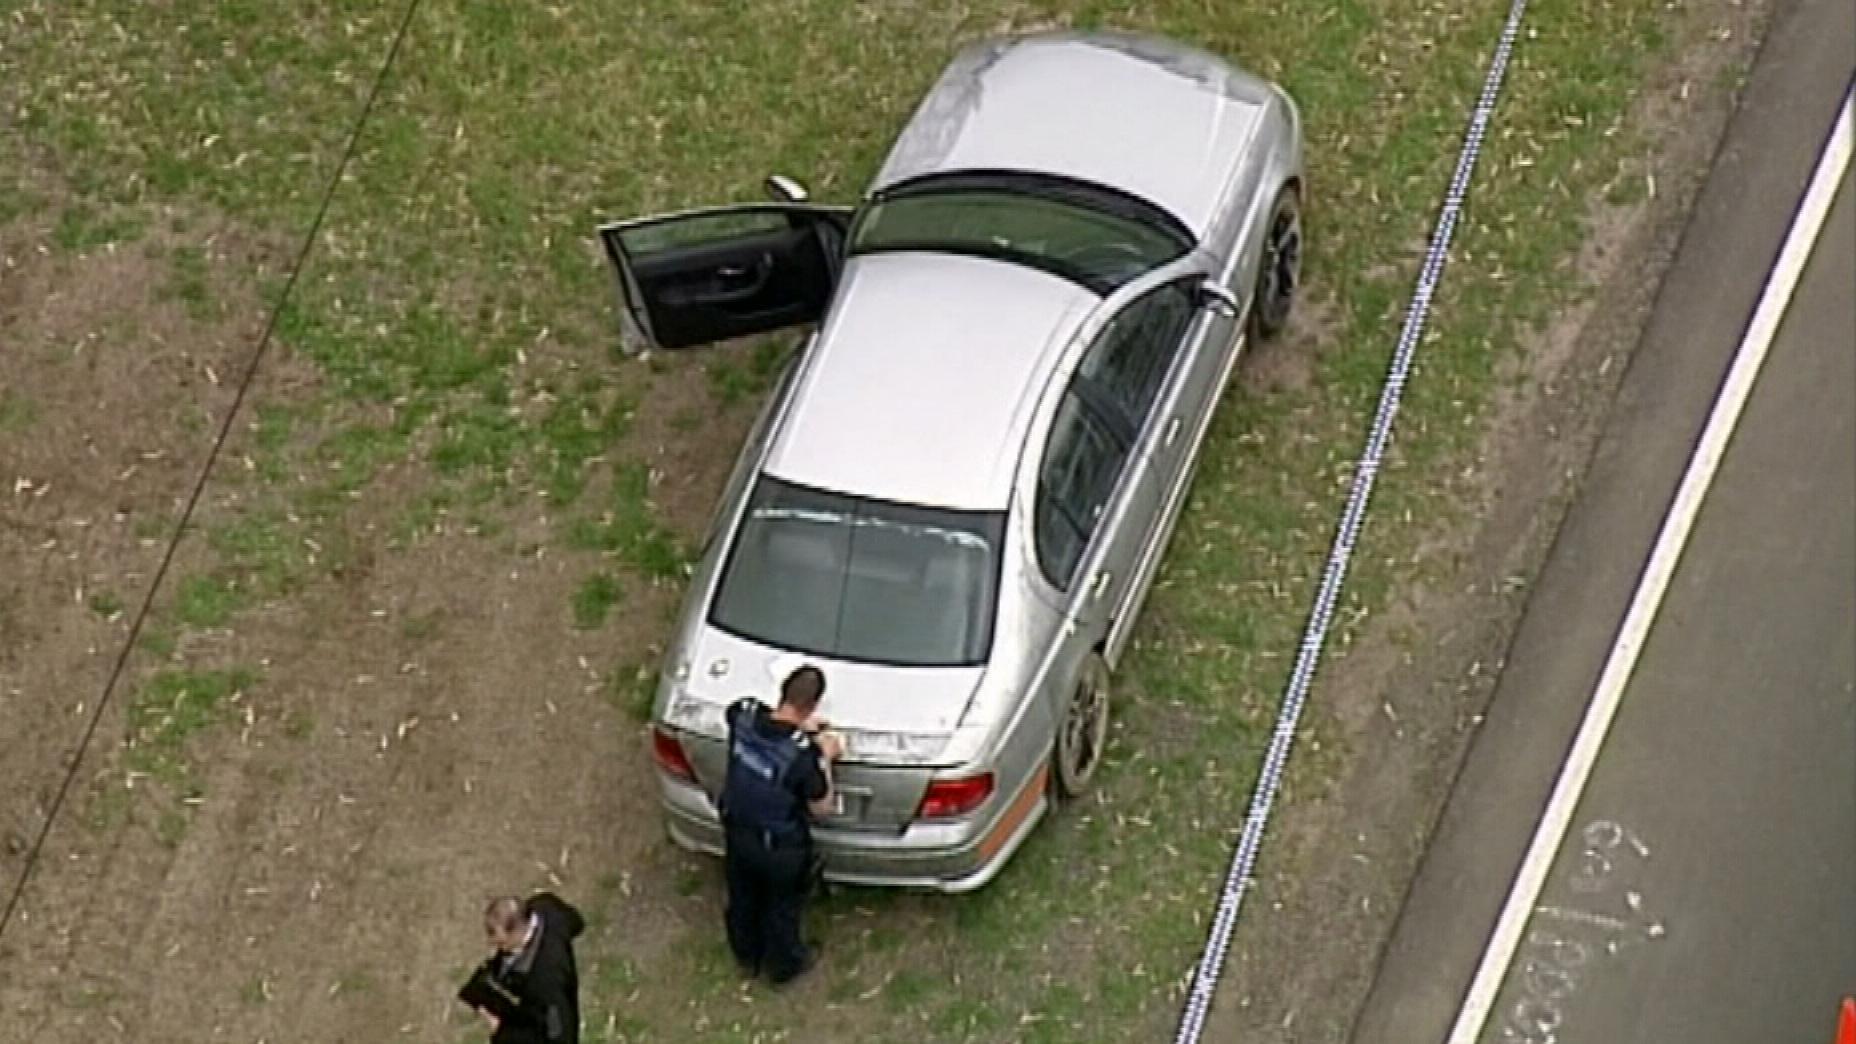 Bound man found in boot of Melbourne car